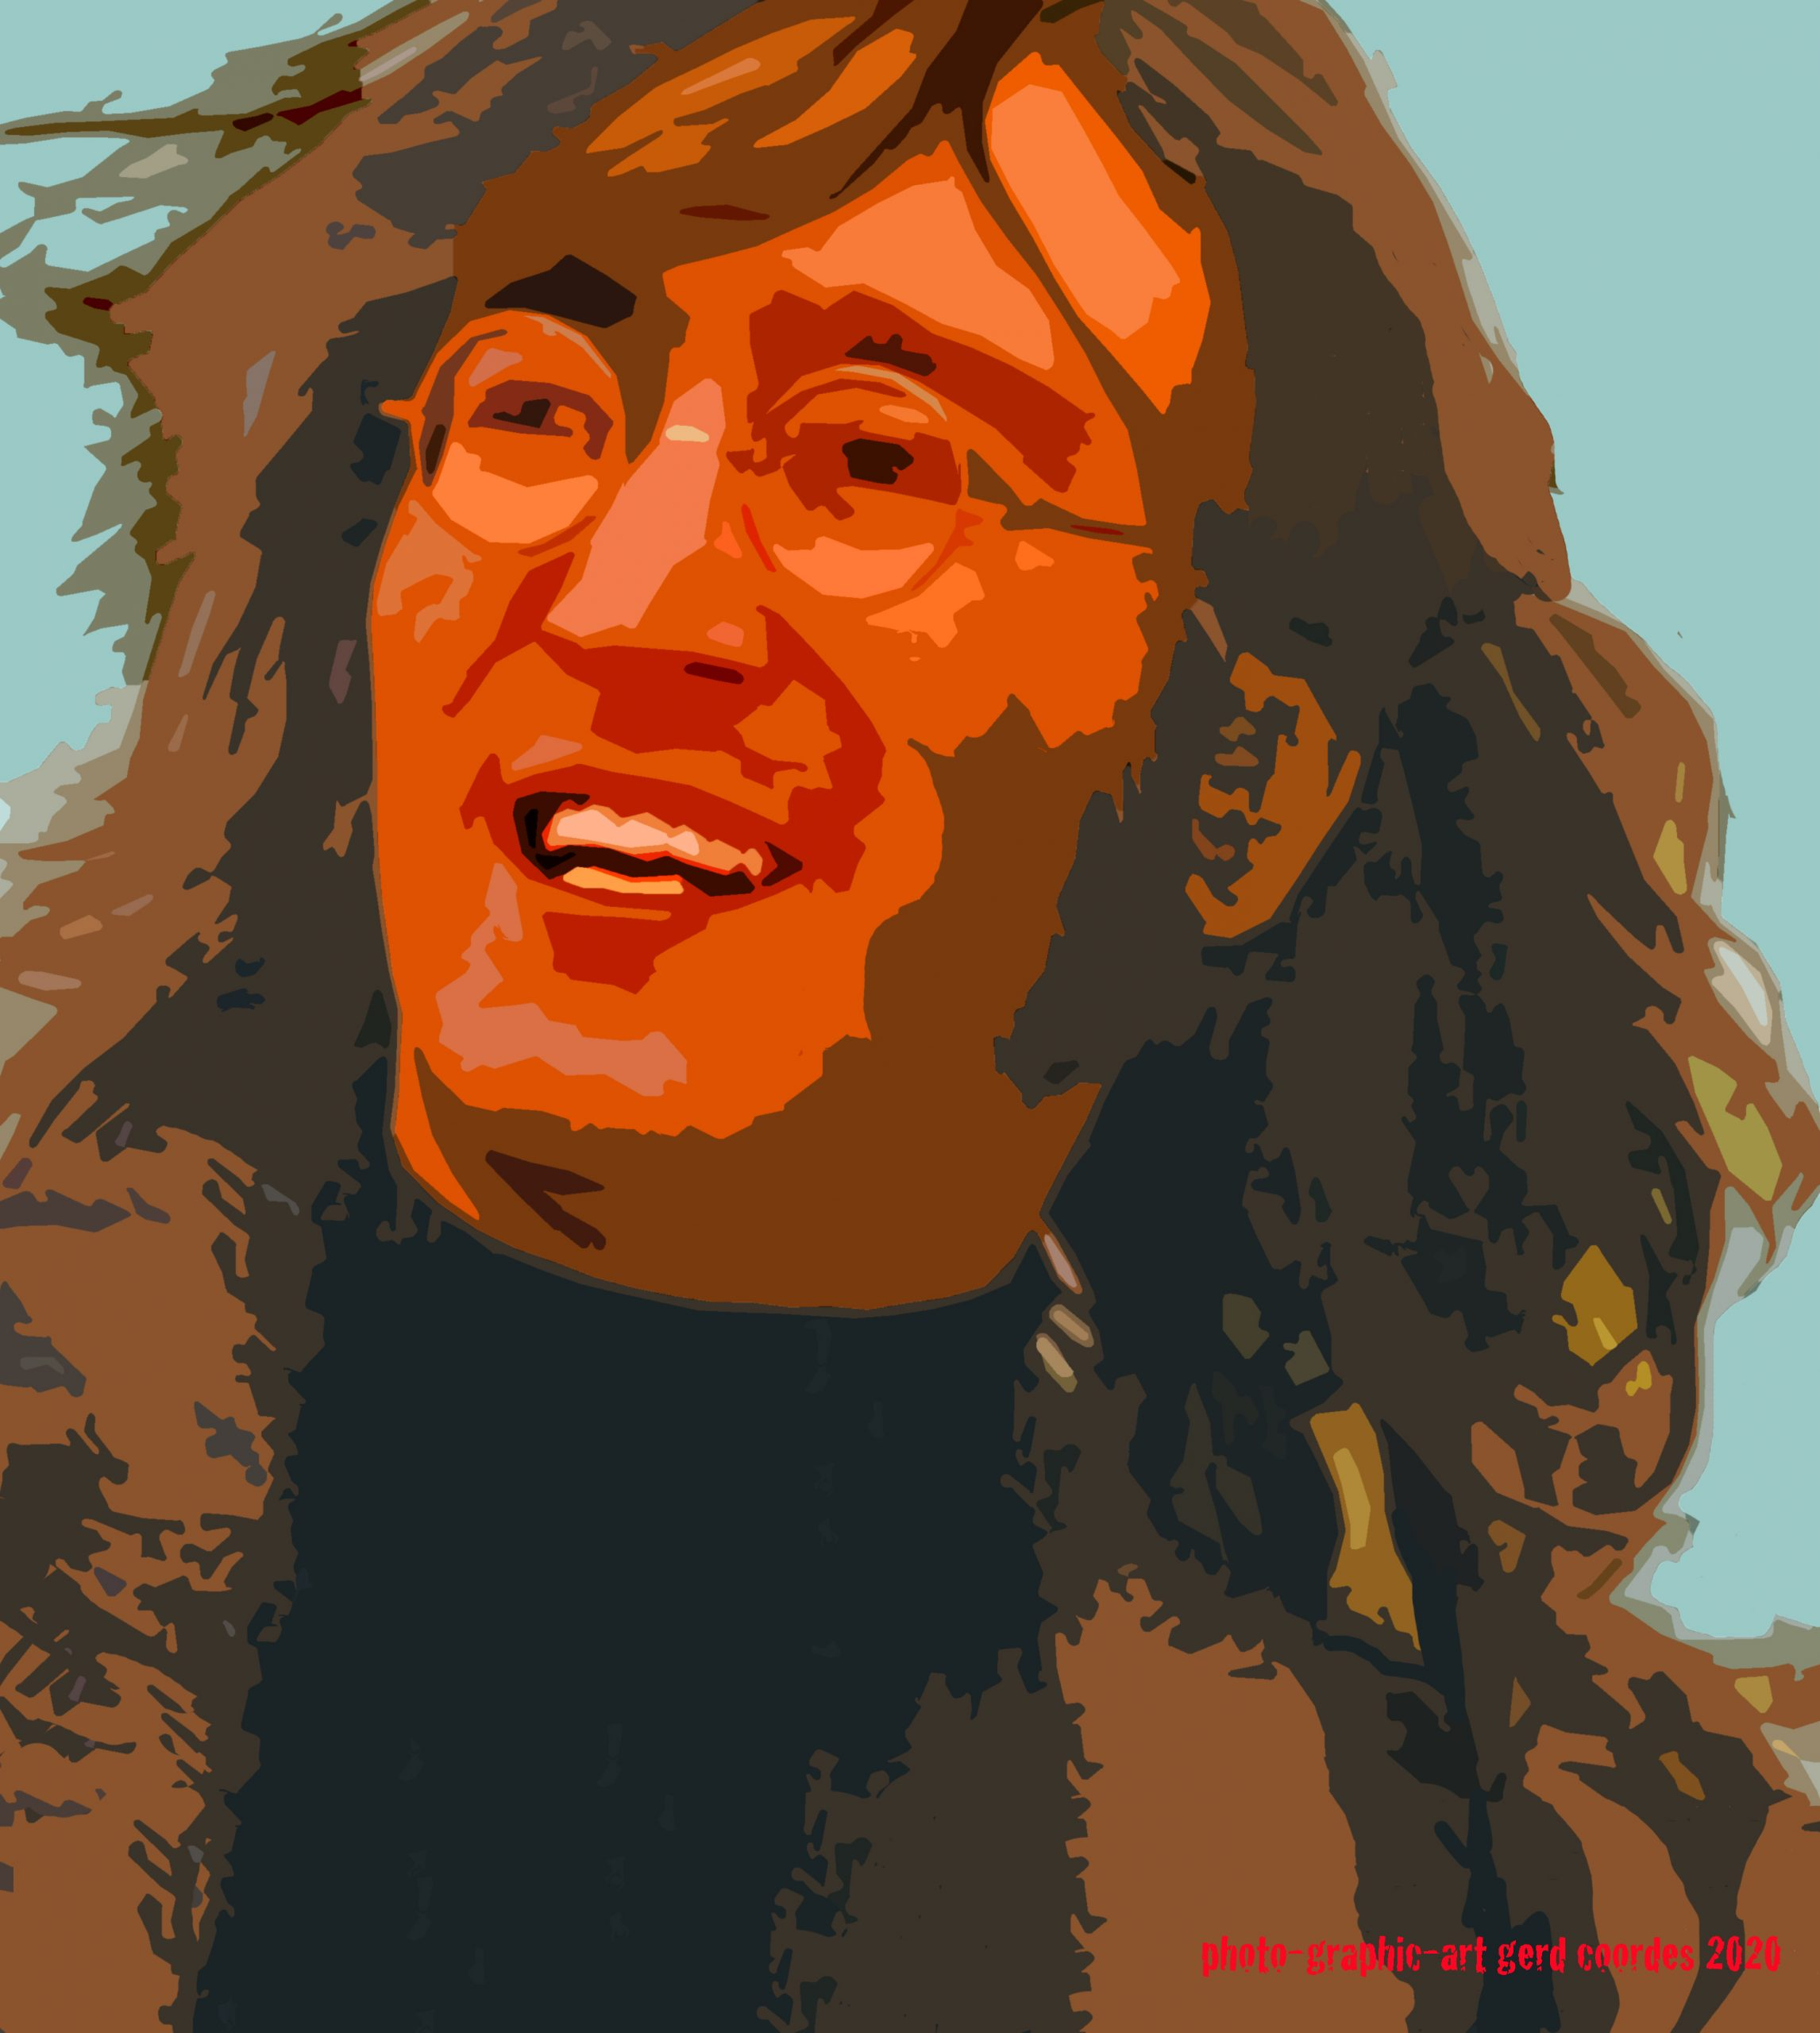 John Lennon - Rooftop Concert Jan. 1969 (Photo-Graphic-Art: Gerd Coordes)